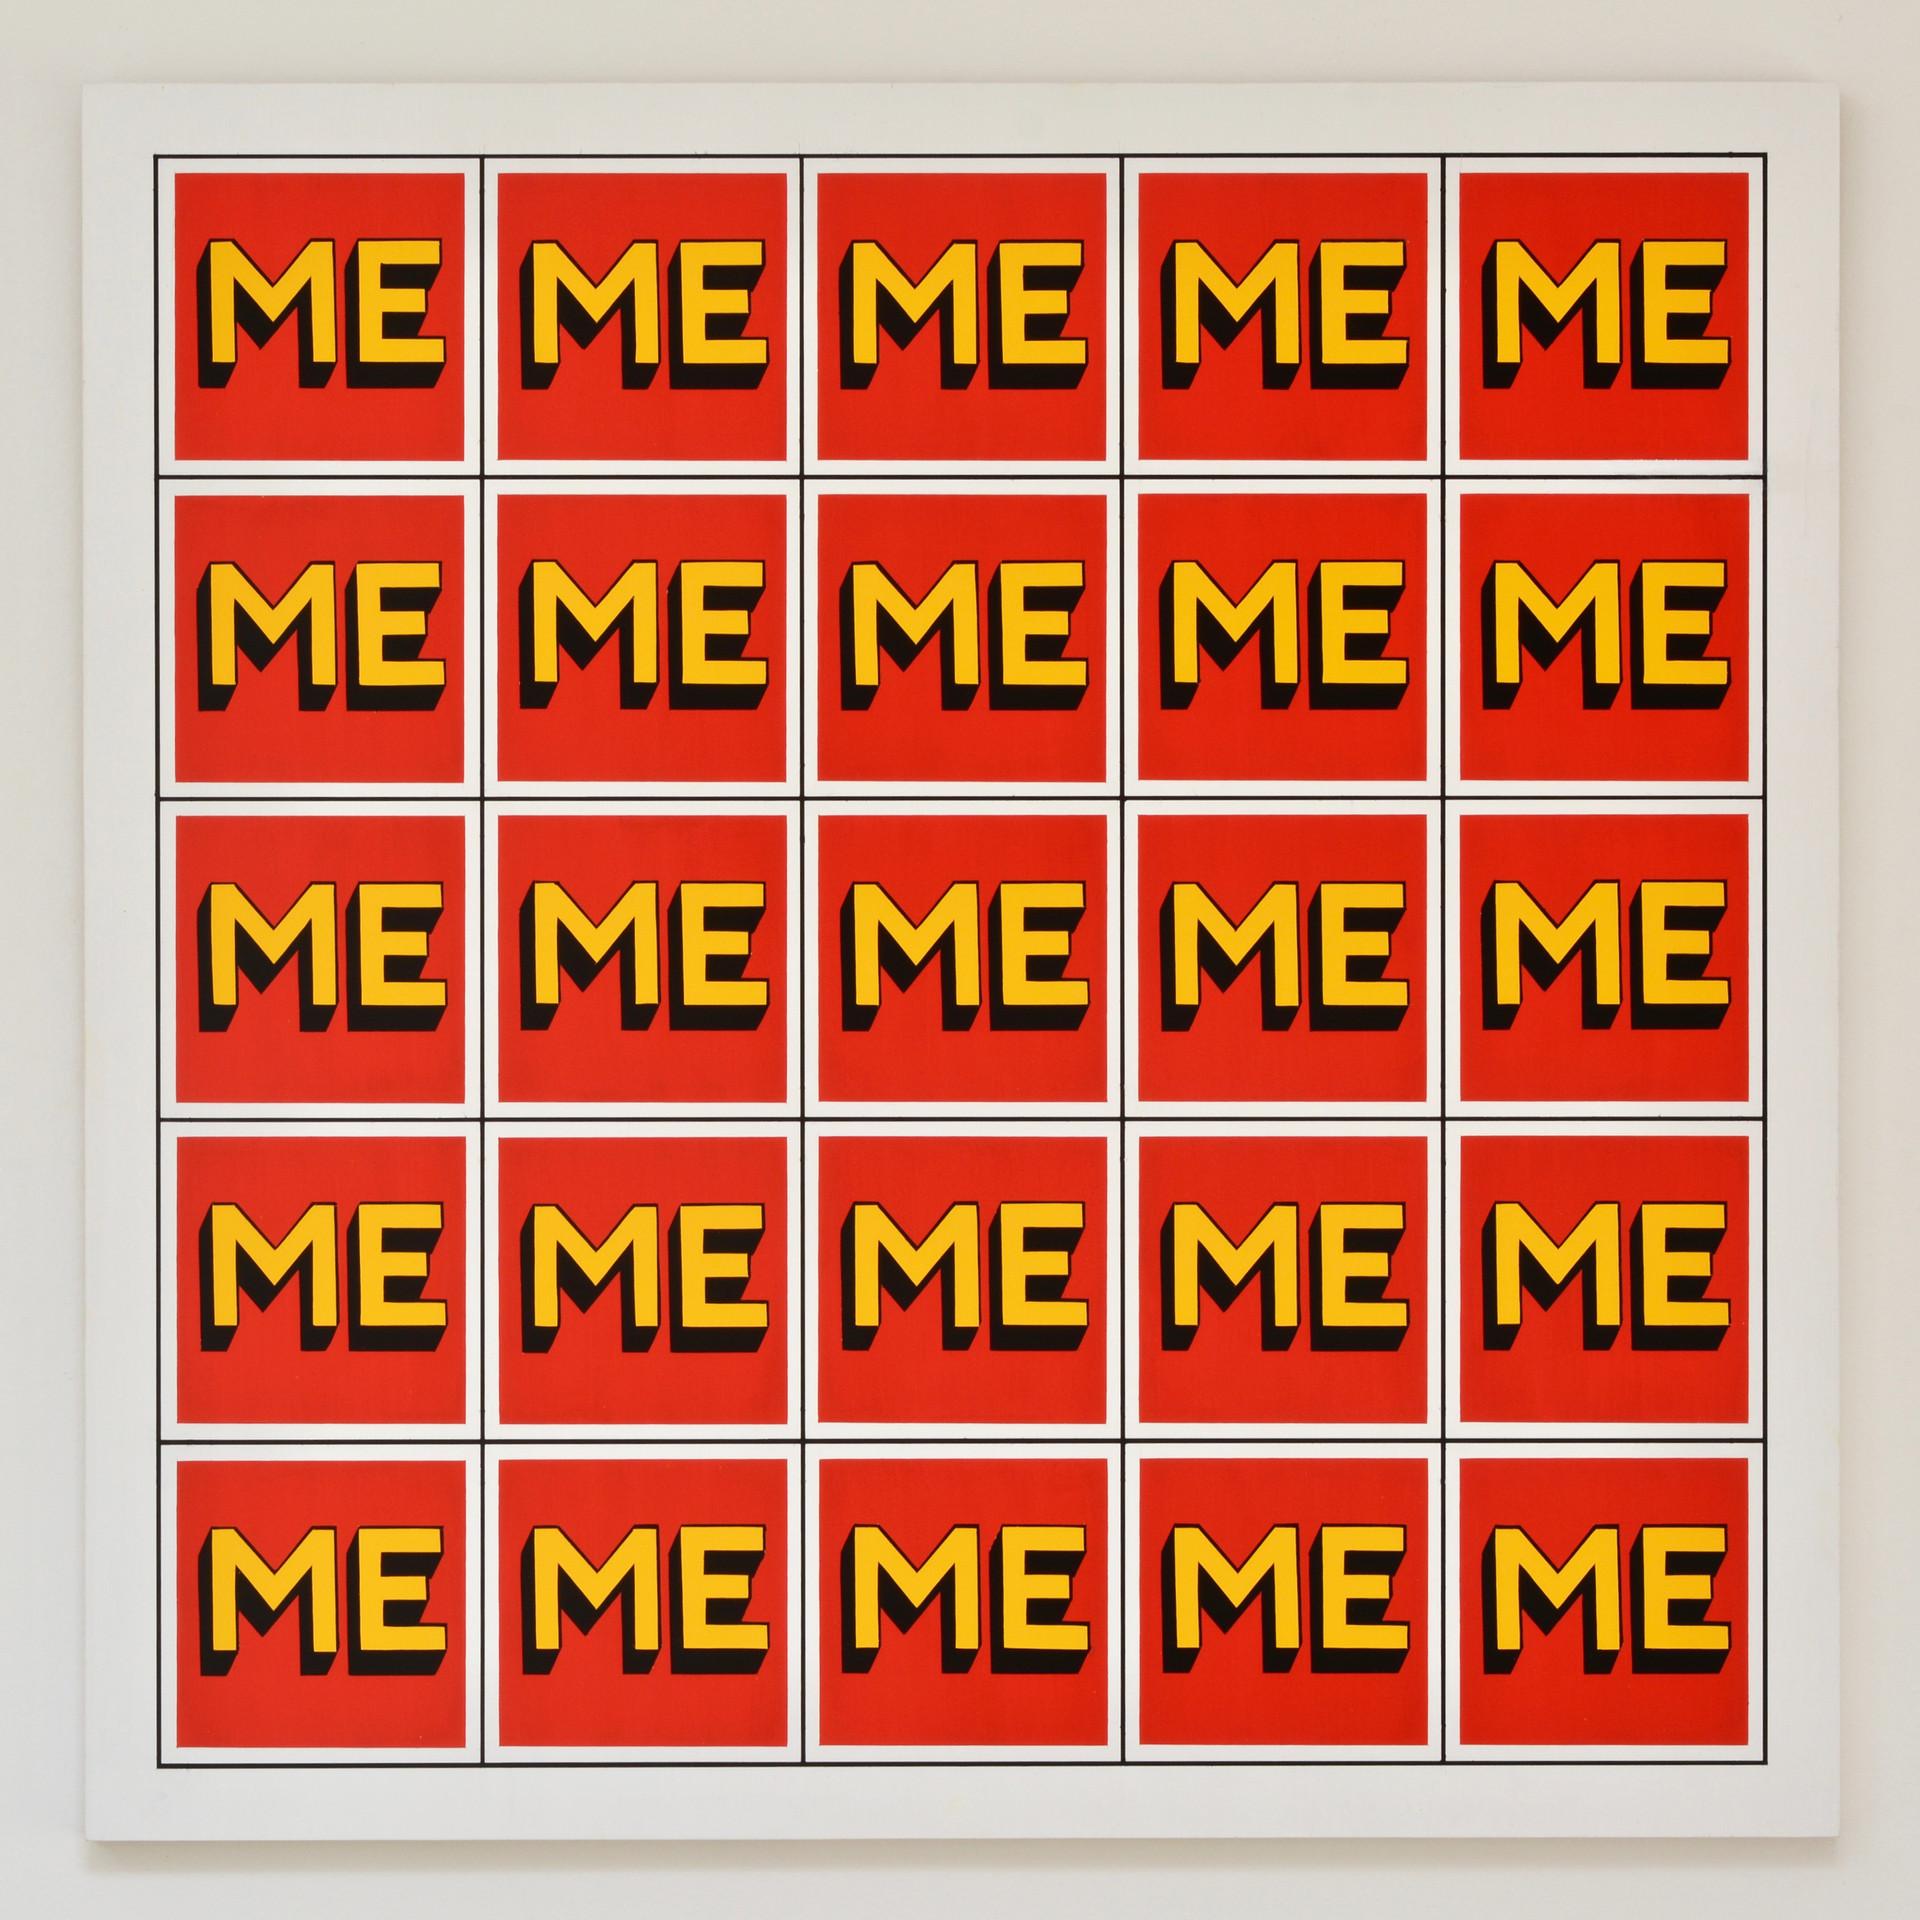 ME_028.jpg